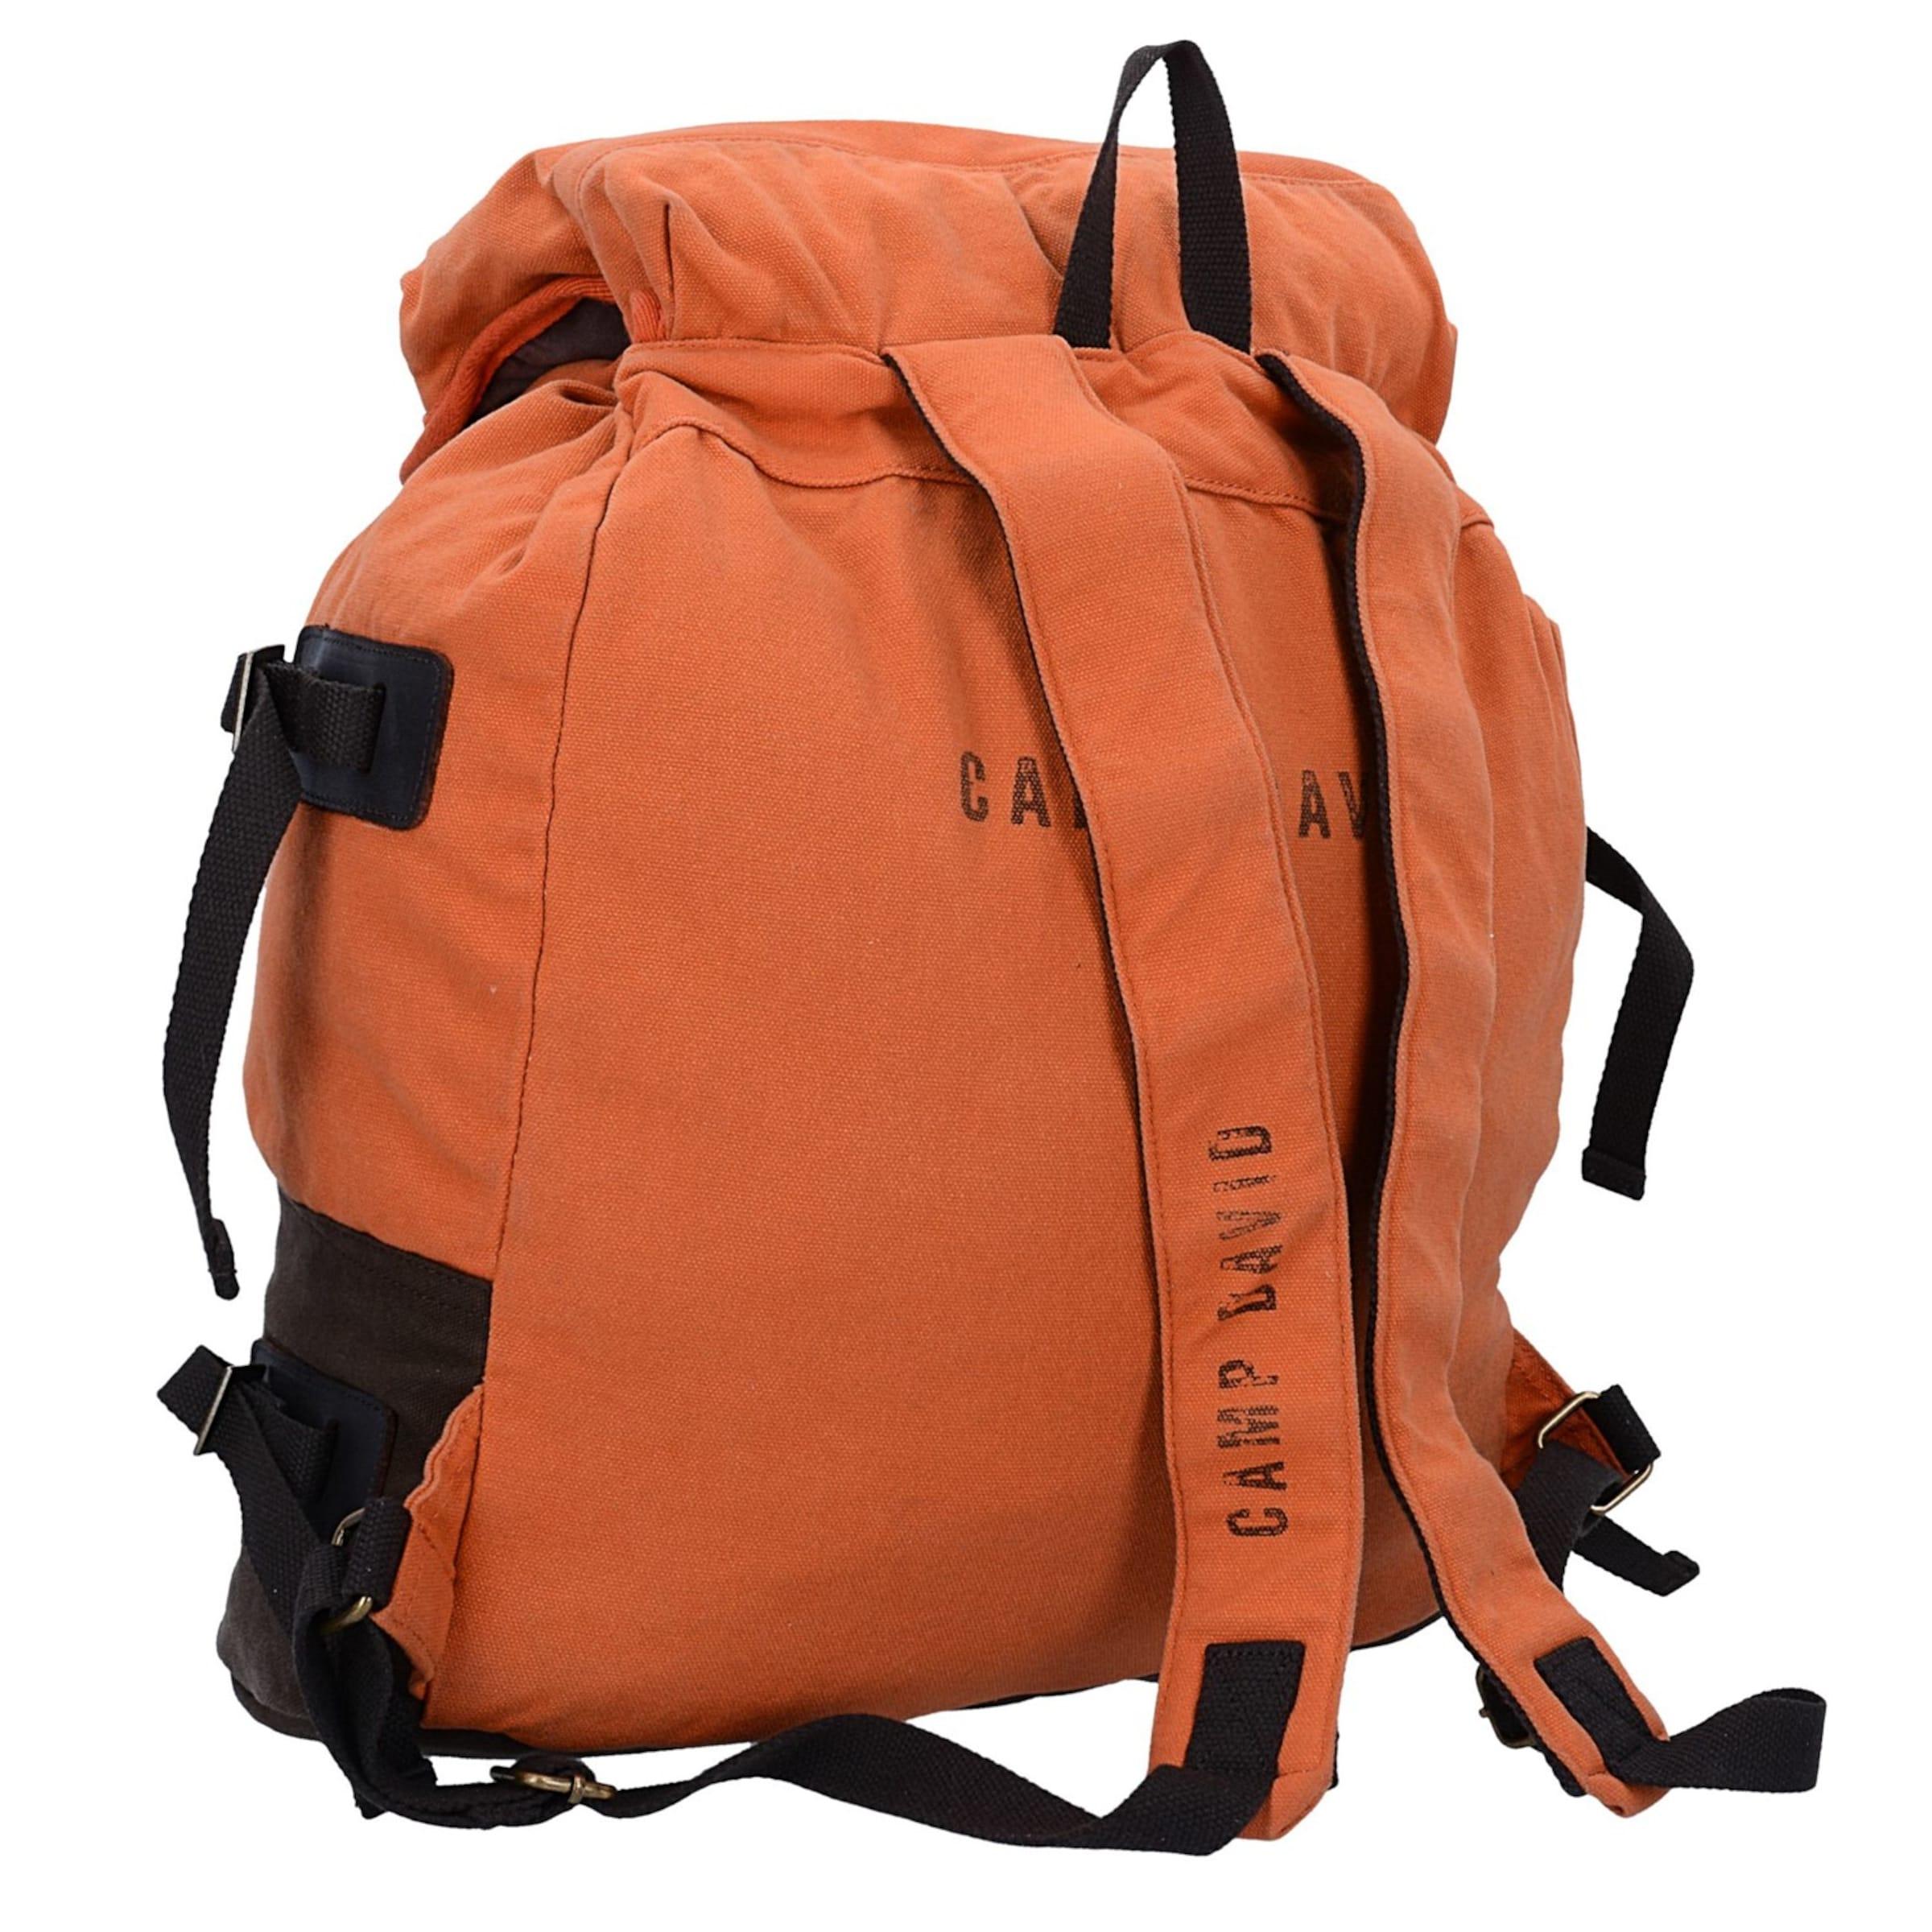 'ortega Rucksack Camp OrangeSchwarz In David River' 4RSc5q3AjL